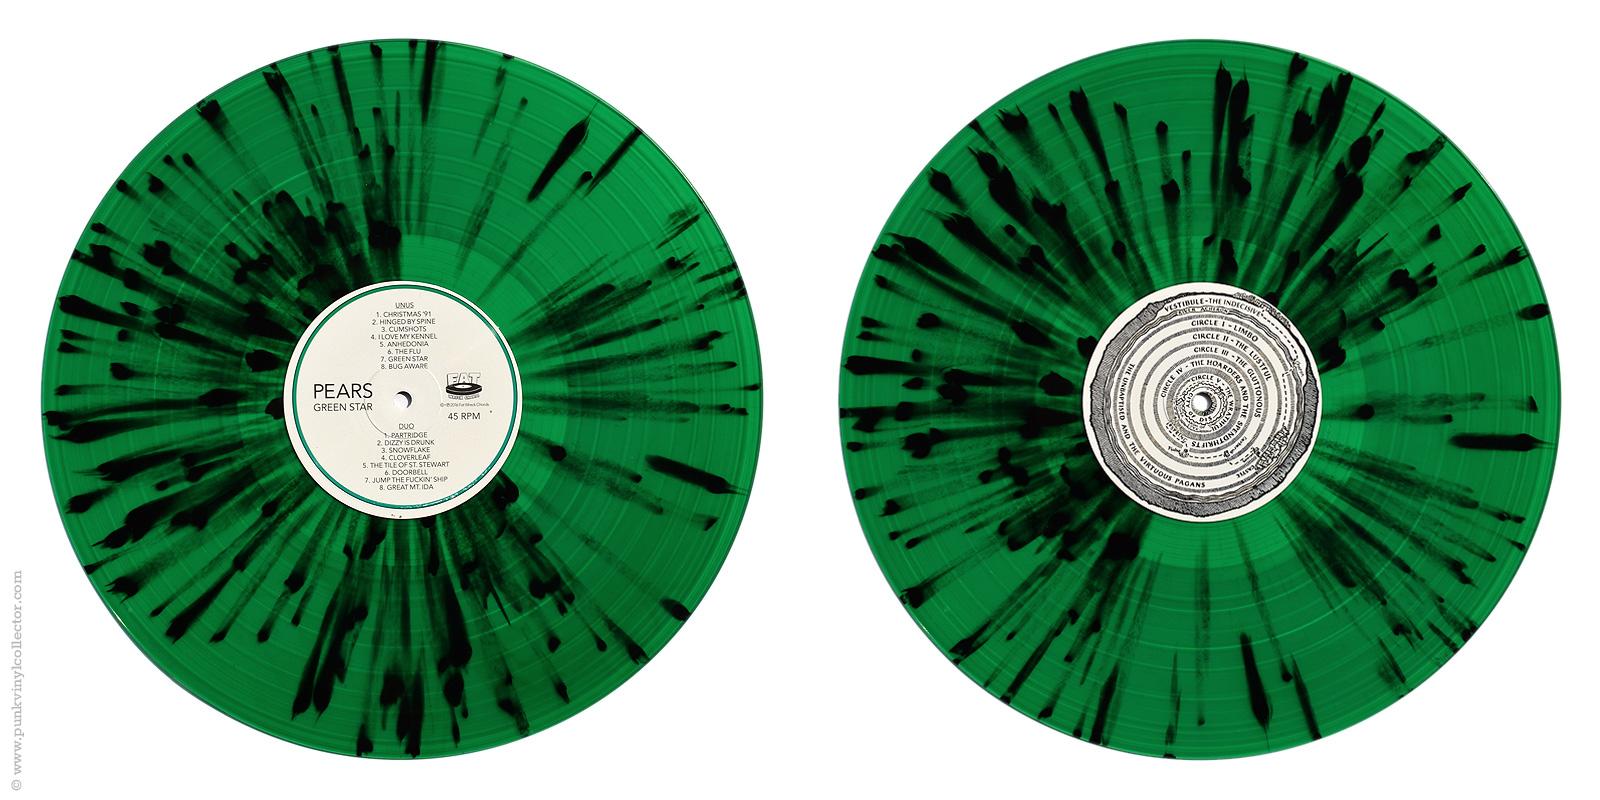 Pears Punk Vinyl Collector